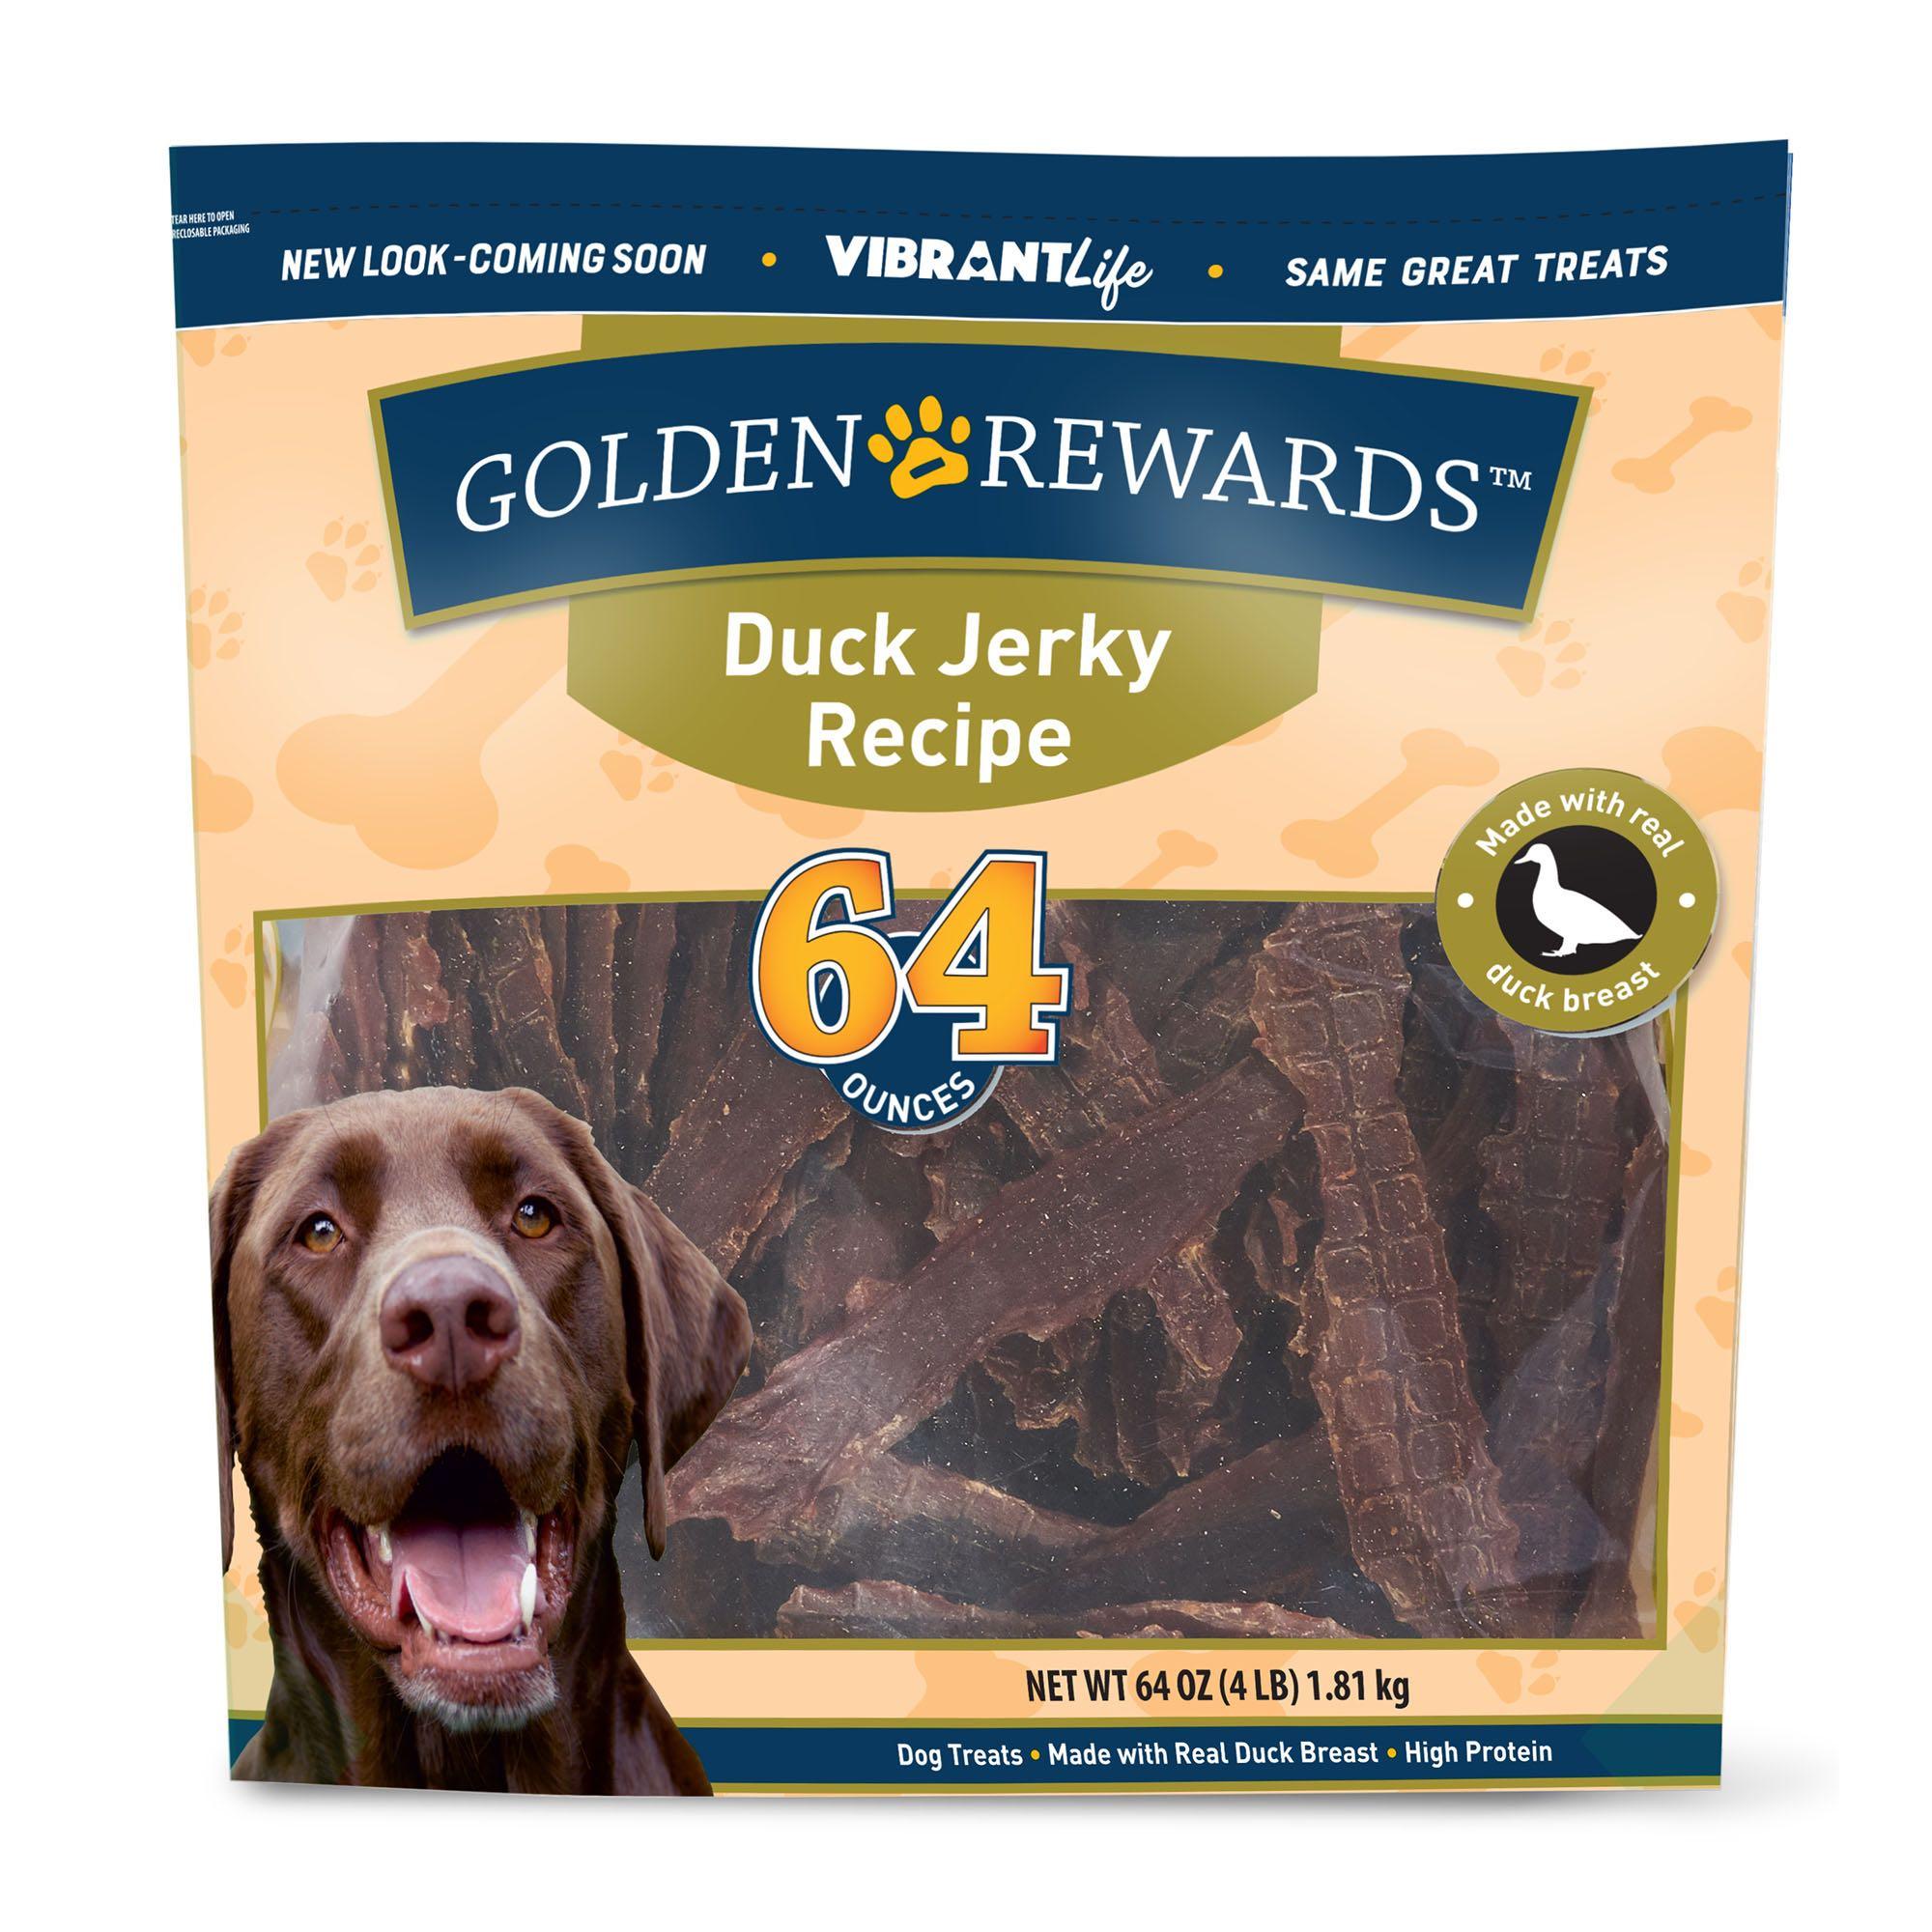 Golden Rewards Duck Jerky Recipe Dog Treats